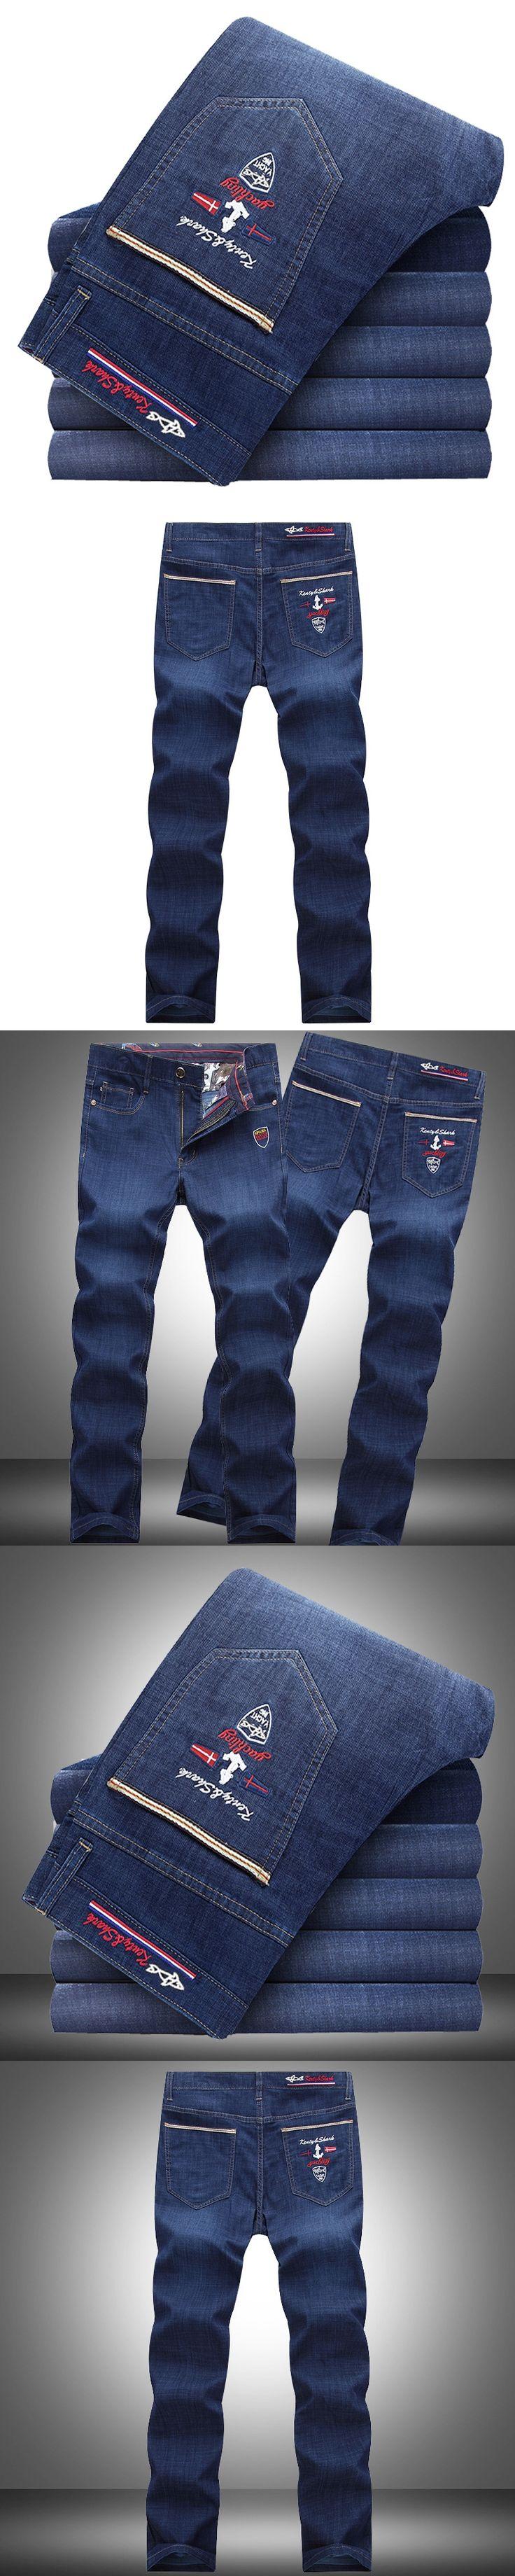 Eden Parak Fashion Tace Shark Men's Jeans Four Seasons France Business Casual Long Jeans High Quality Hommes New Style